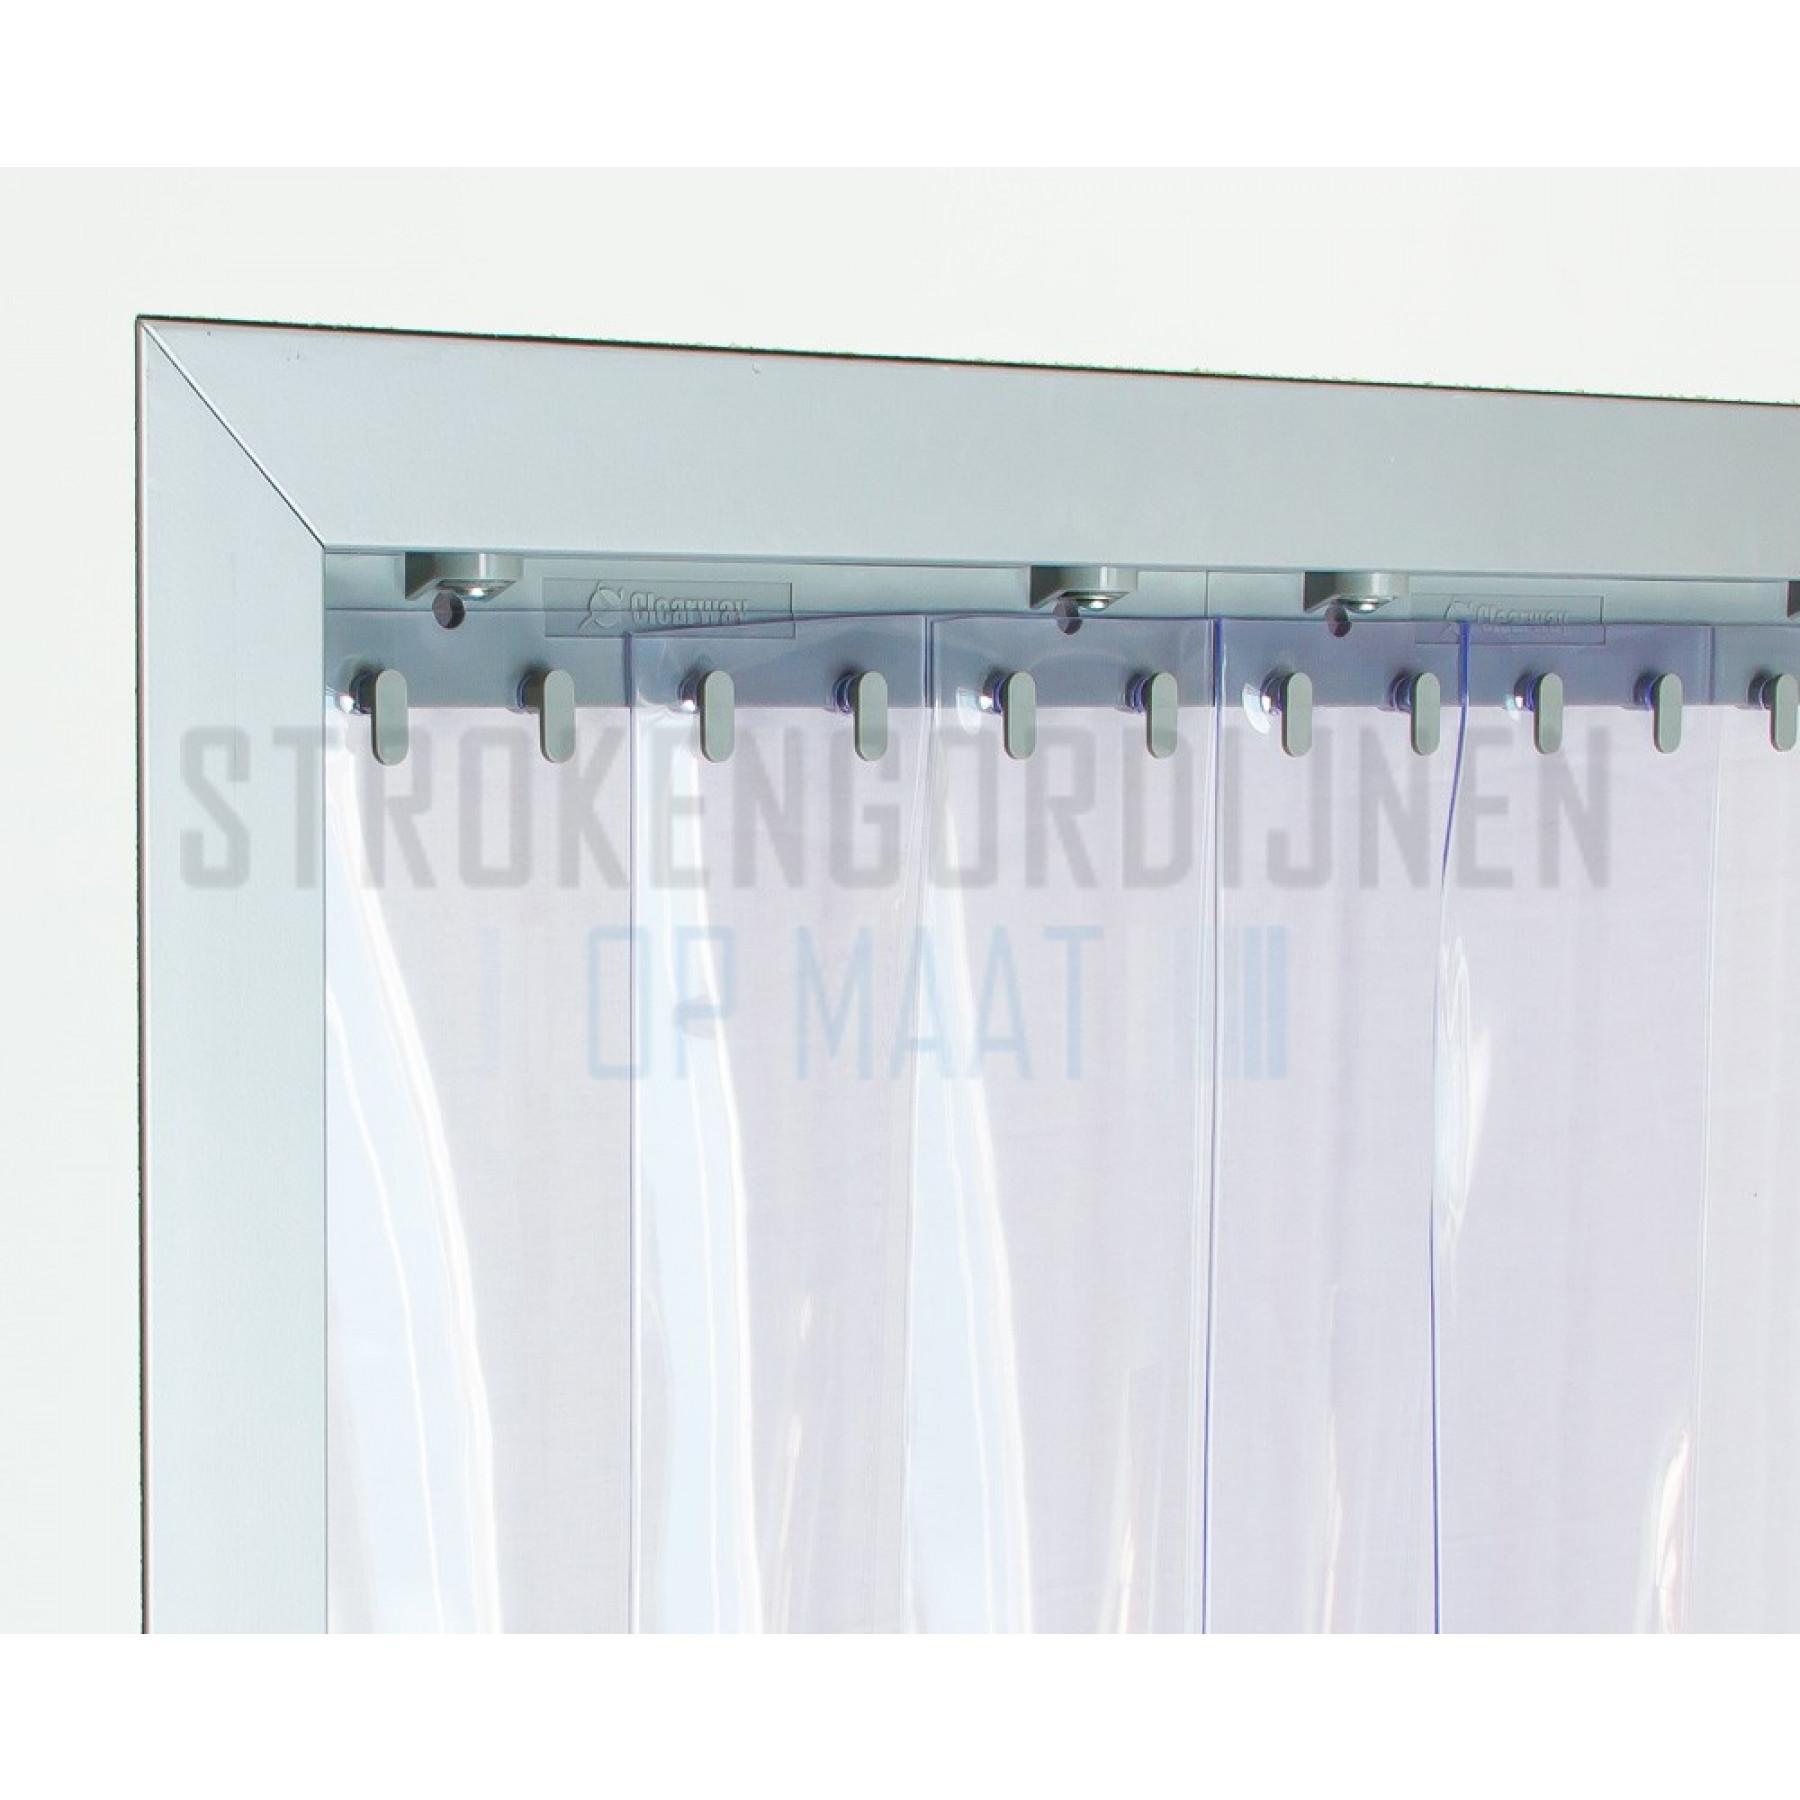 PVC Rolle, antistatisch, 200mm breit, 2mm dick, 50 meter lang, transparent